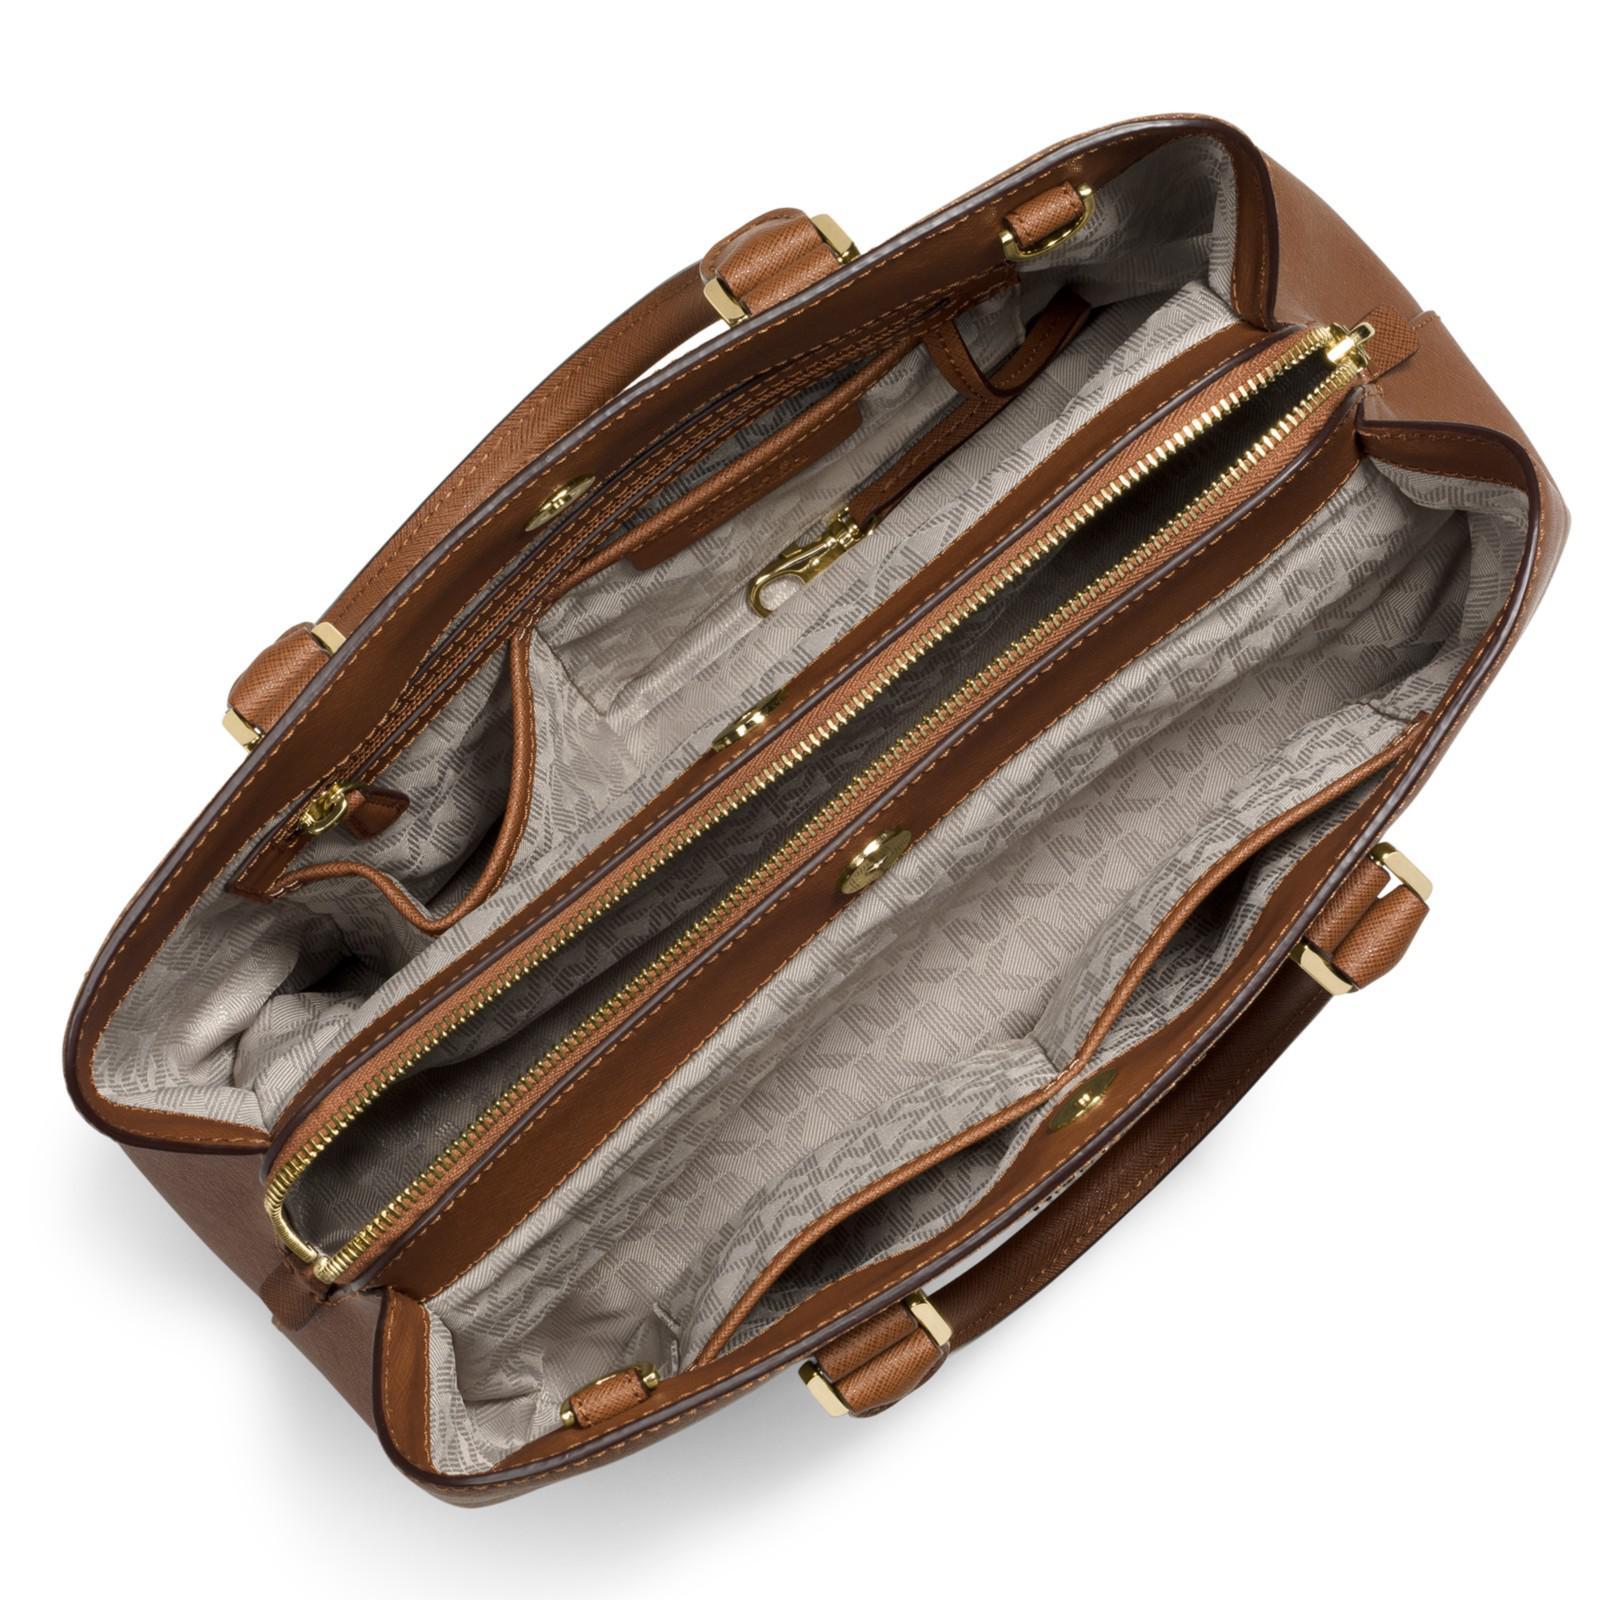 82bec02654e4 Michael Michael Kors Savannah Large Leather Satchel in Brown - Lyst